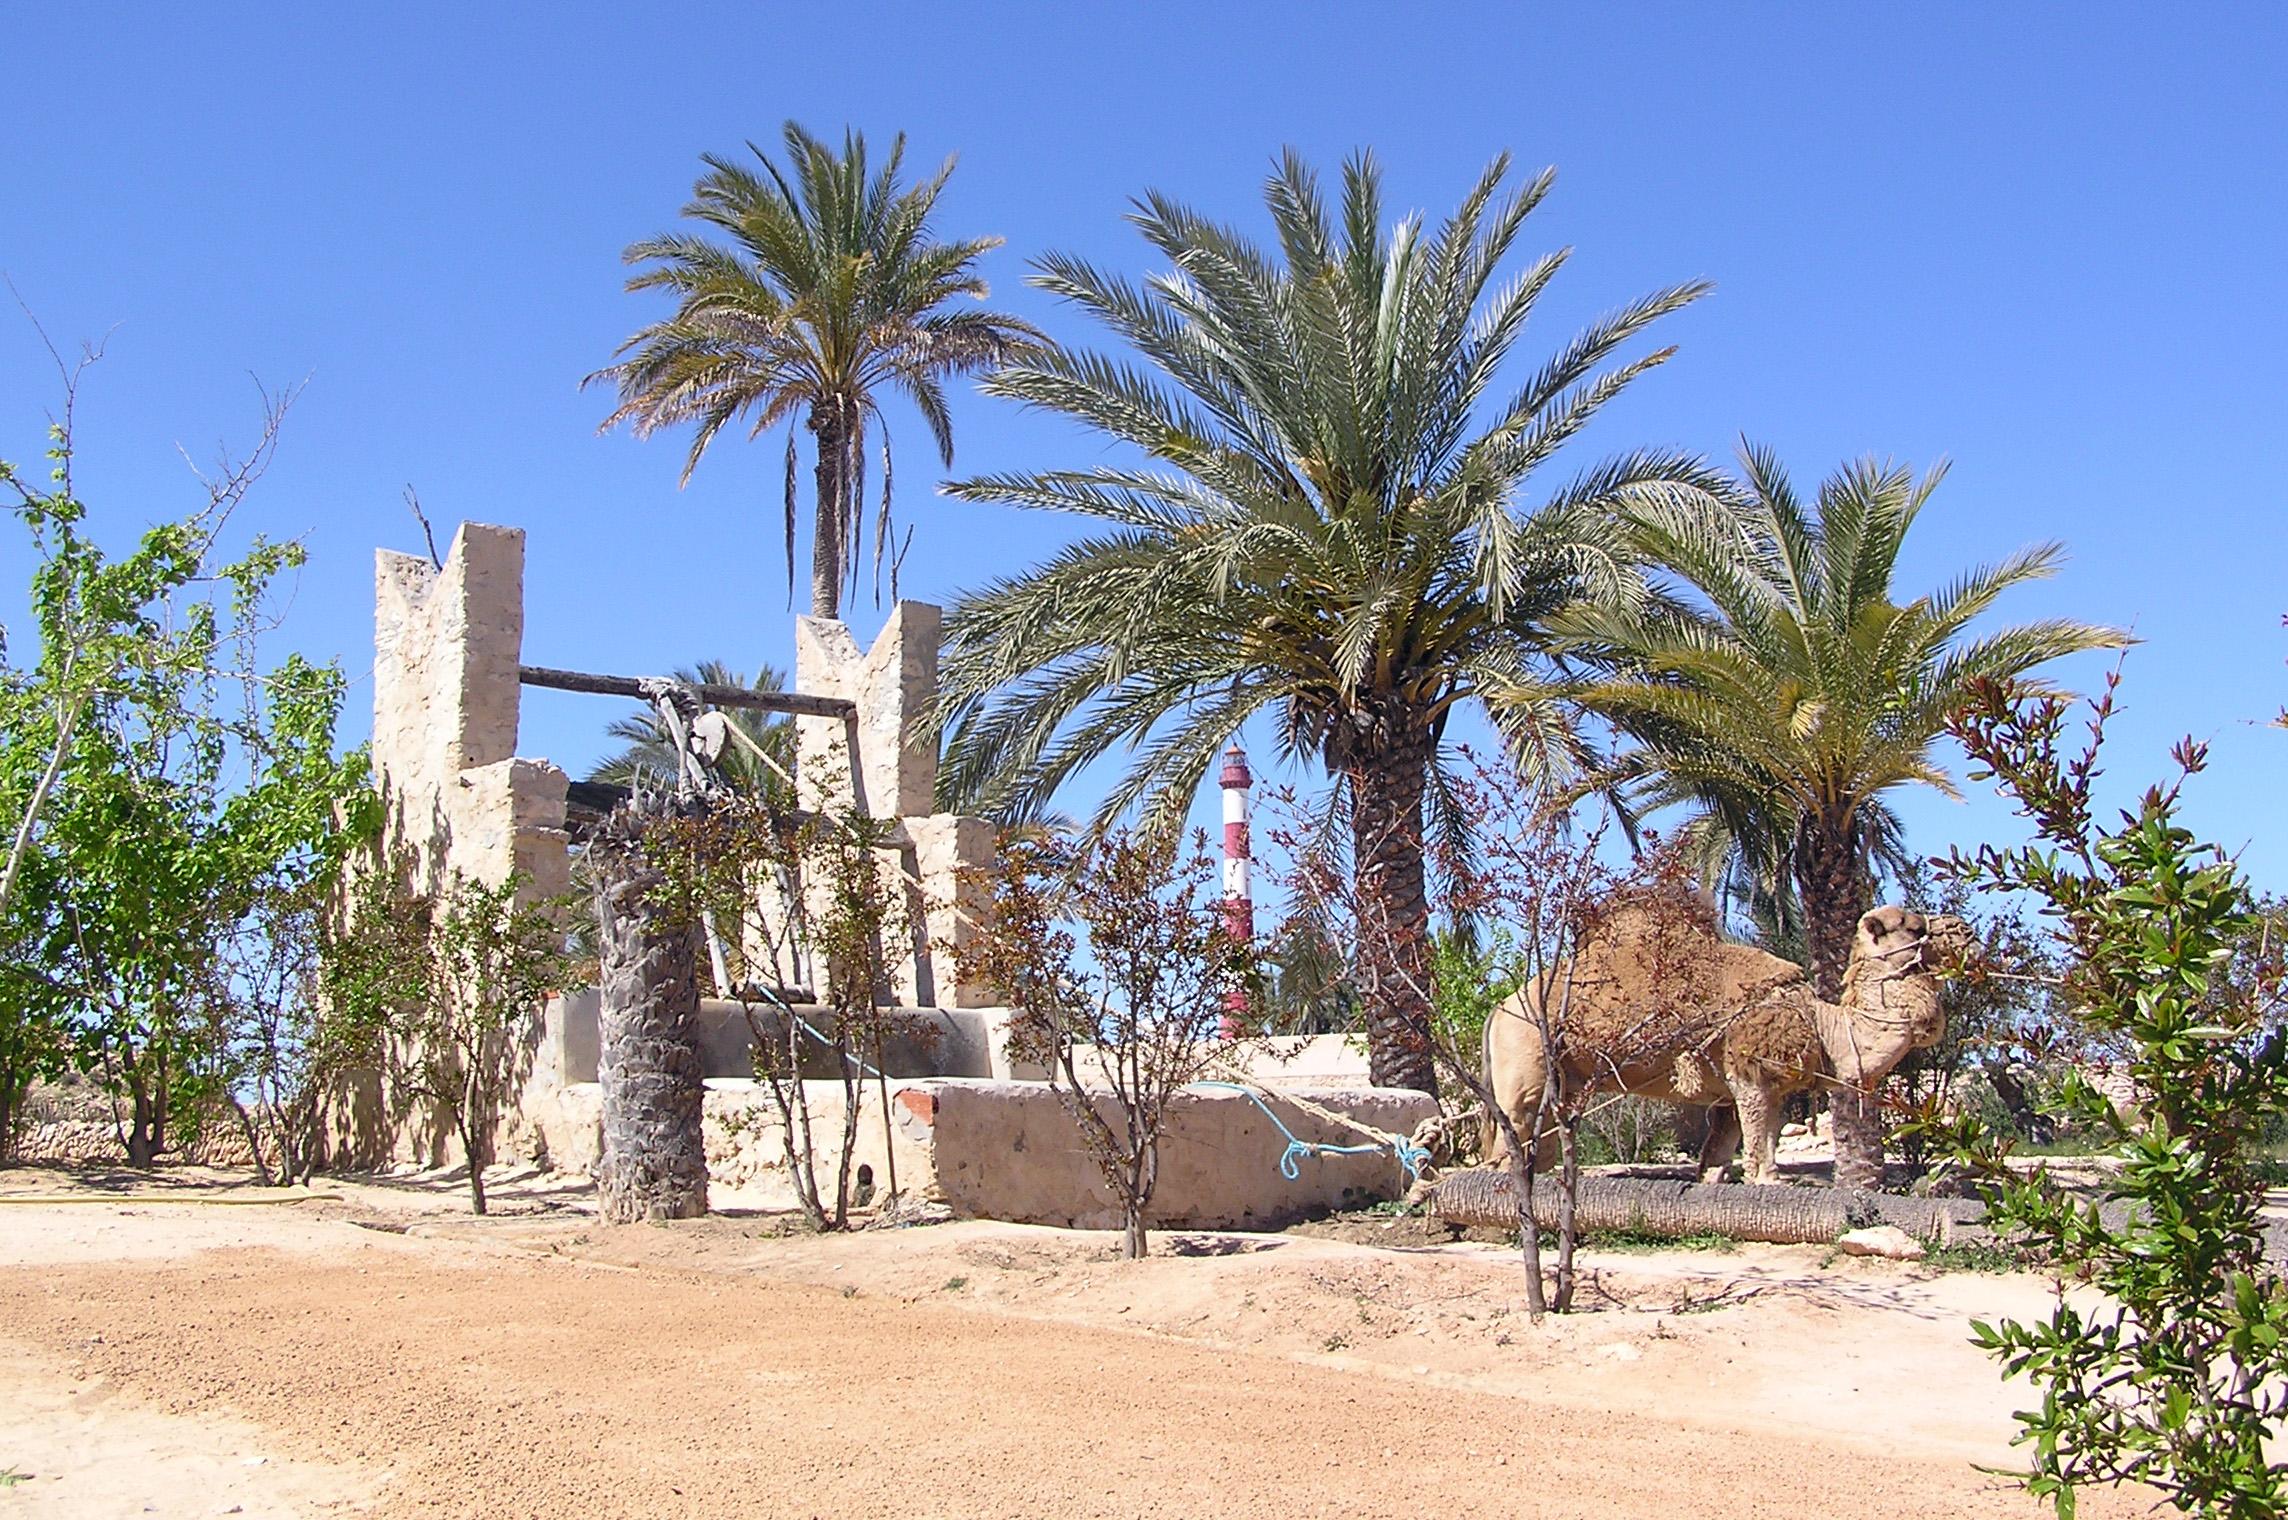 Old well in Djerba